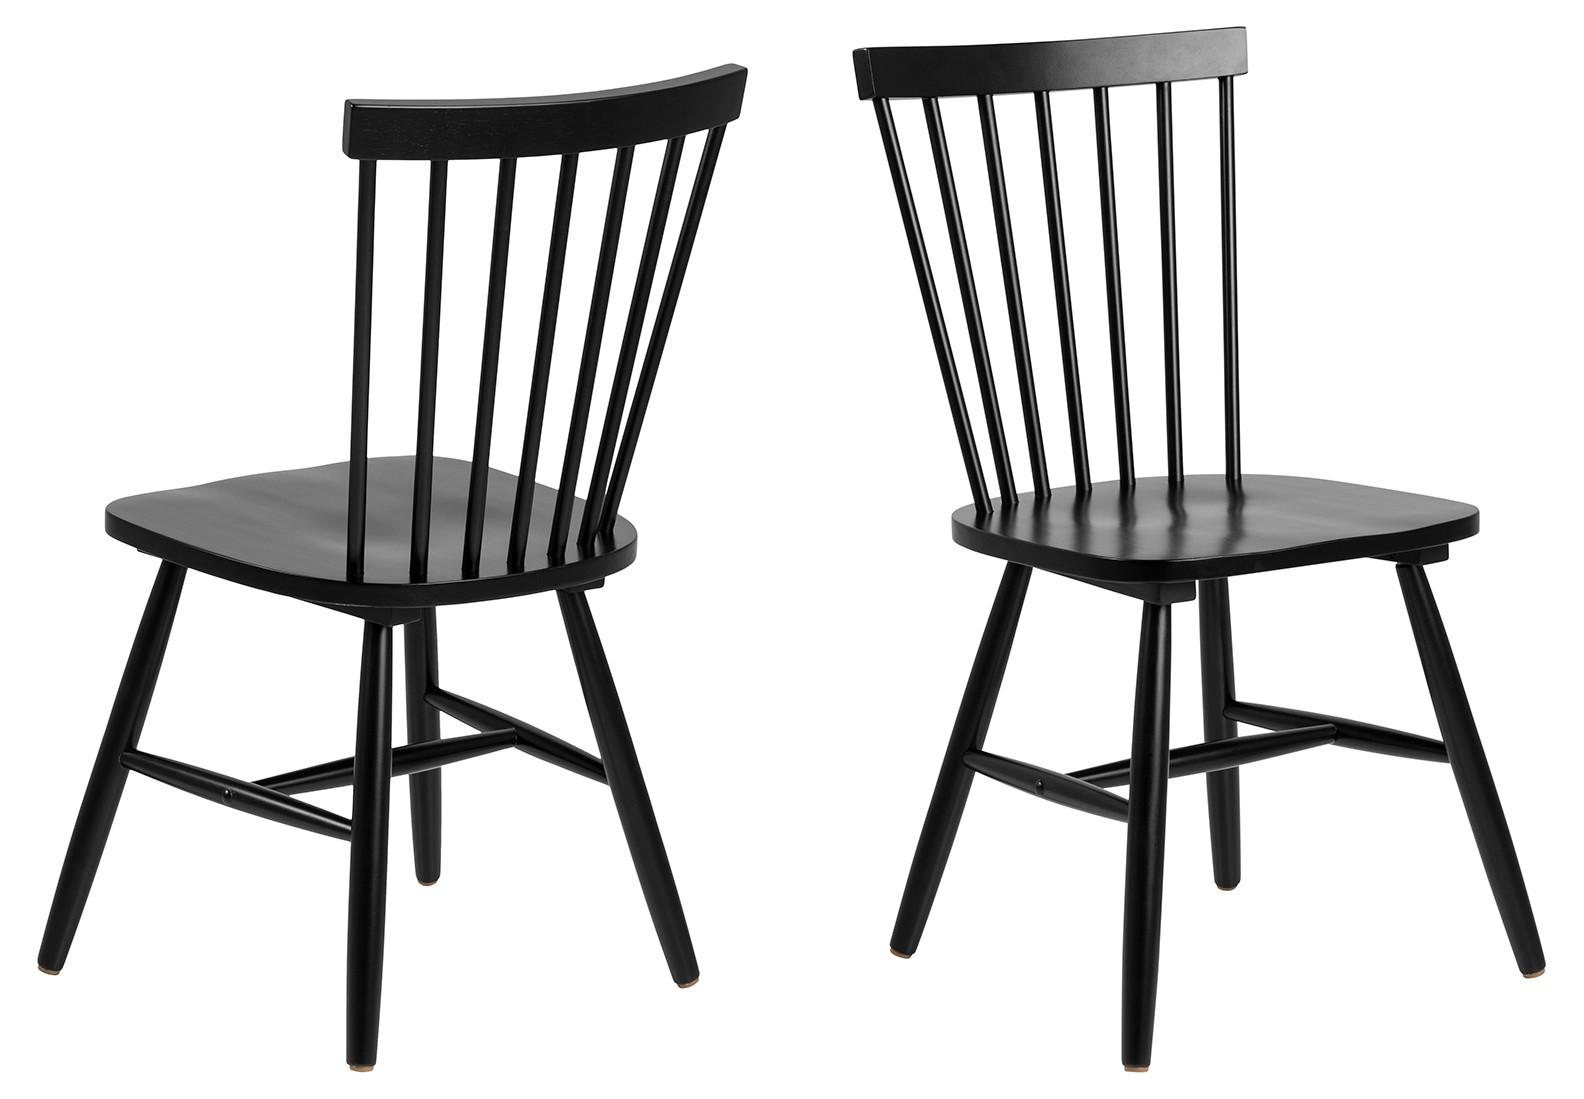 Riano Spisebordsstole